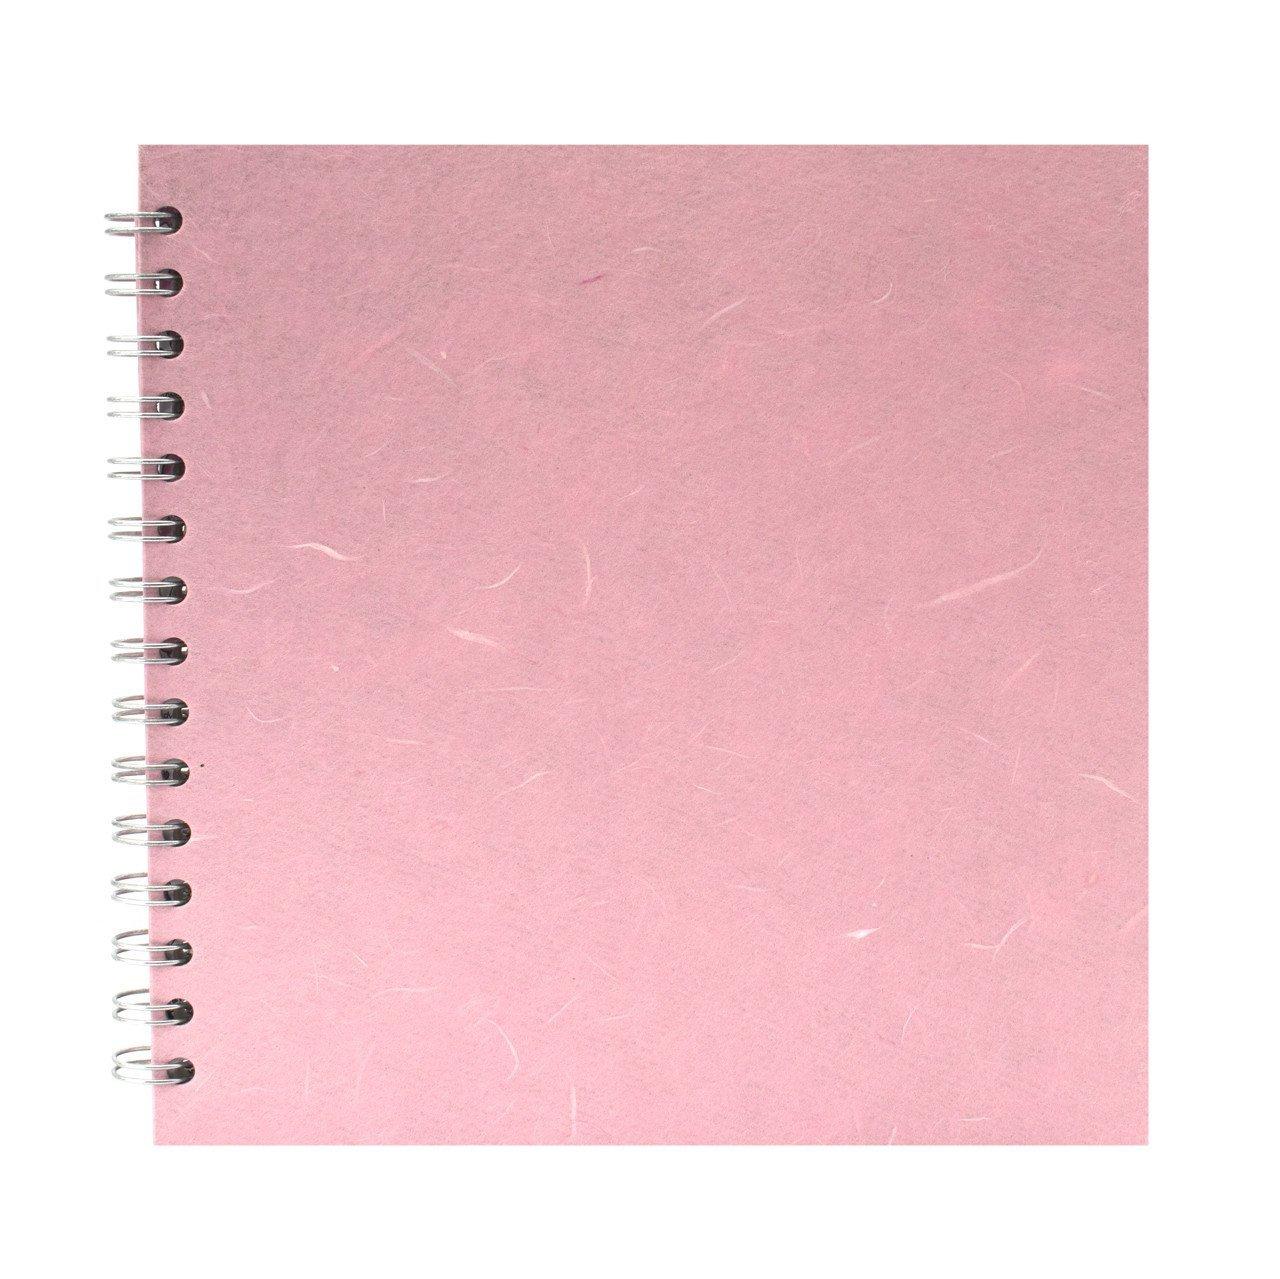 Blocco da disegno carta bianca motivo: Posh Banana Pig 20 x 20 cm Pink Pig colore: Azzurro cielo